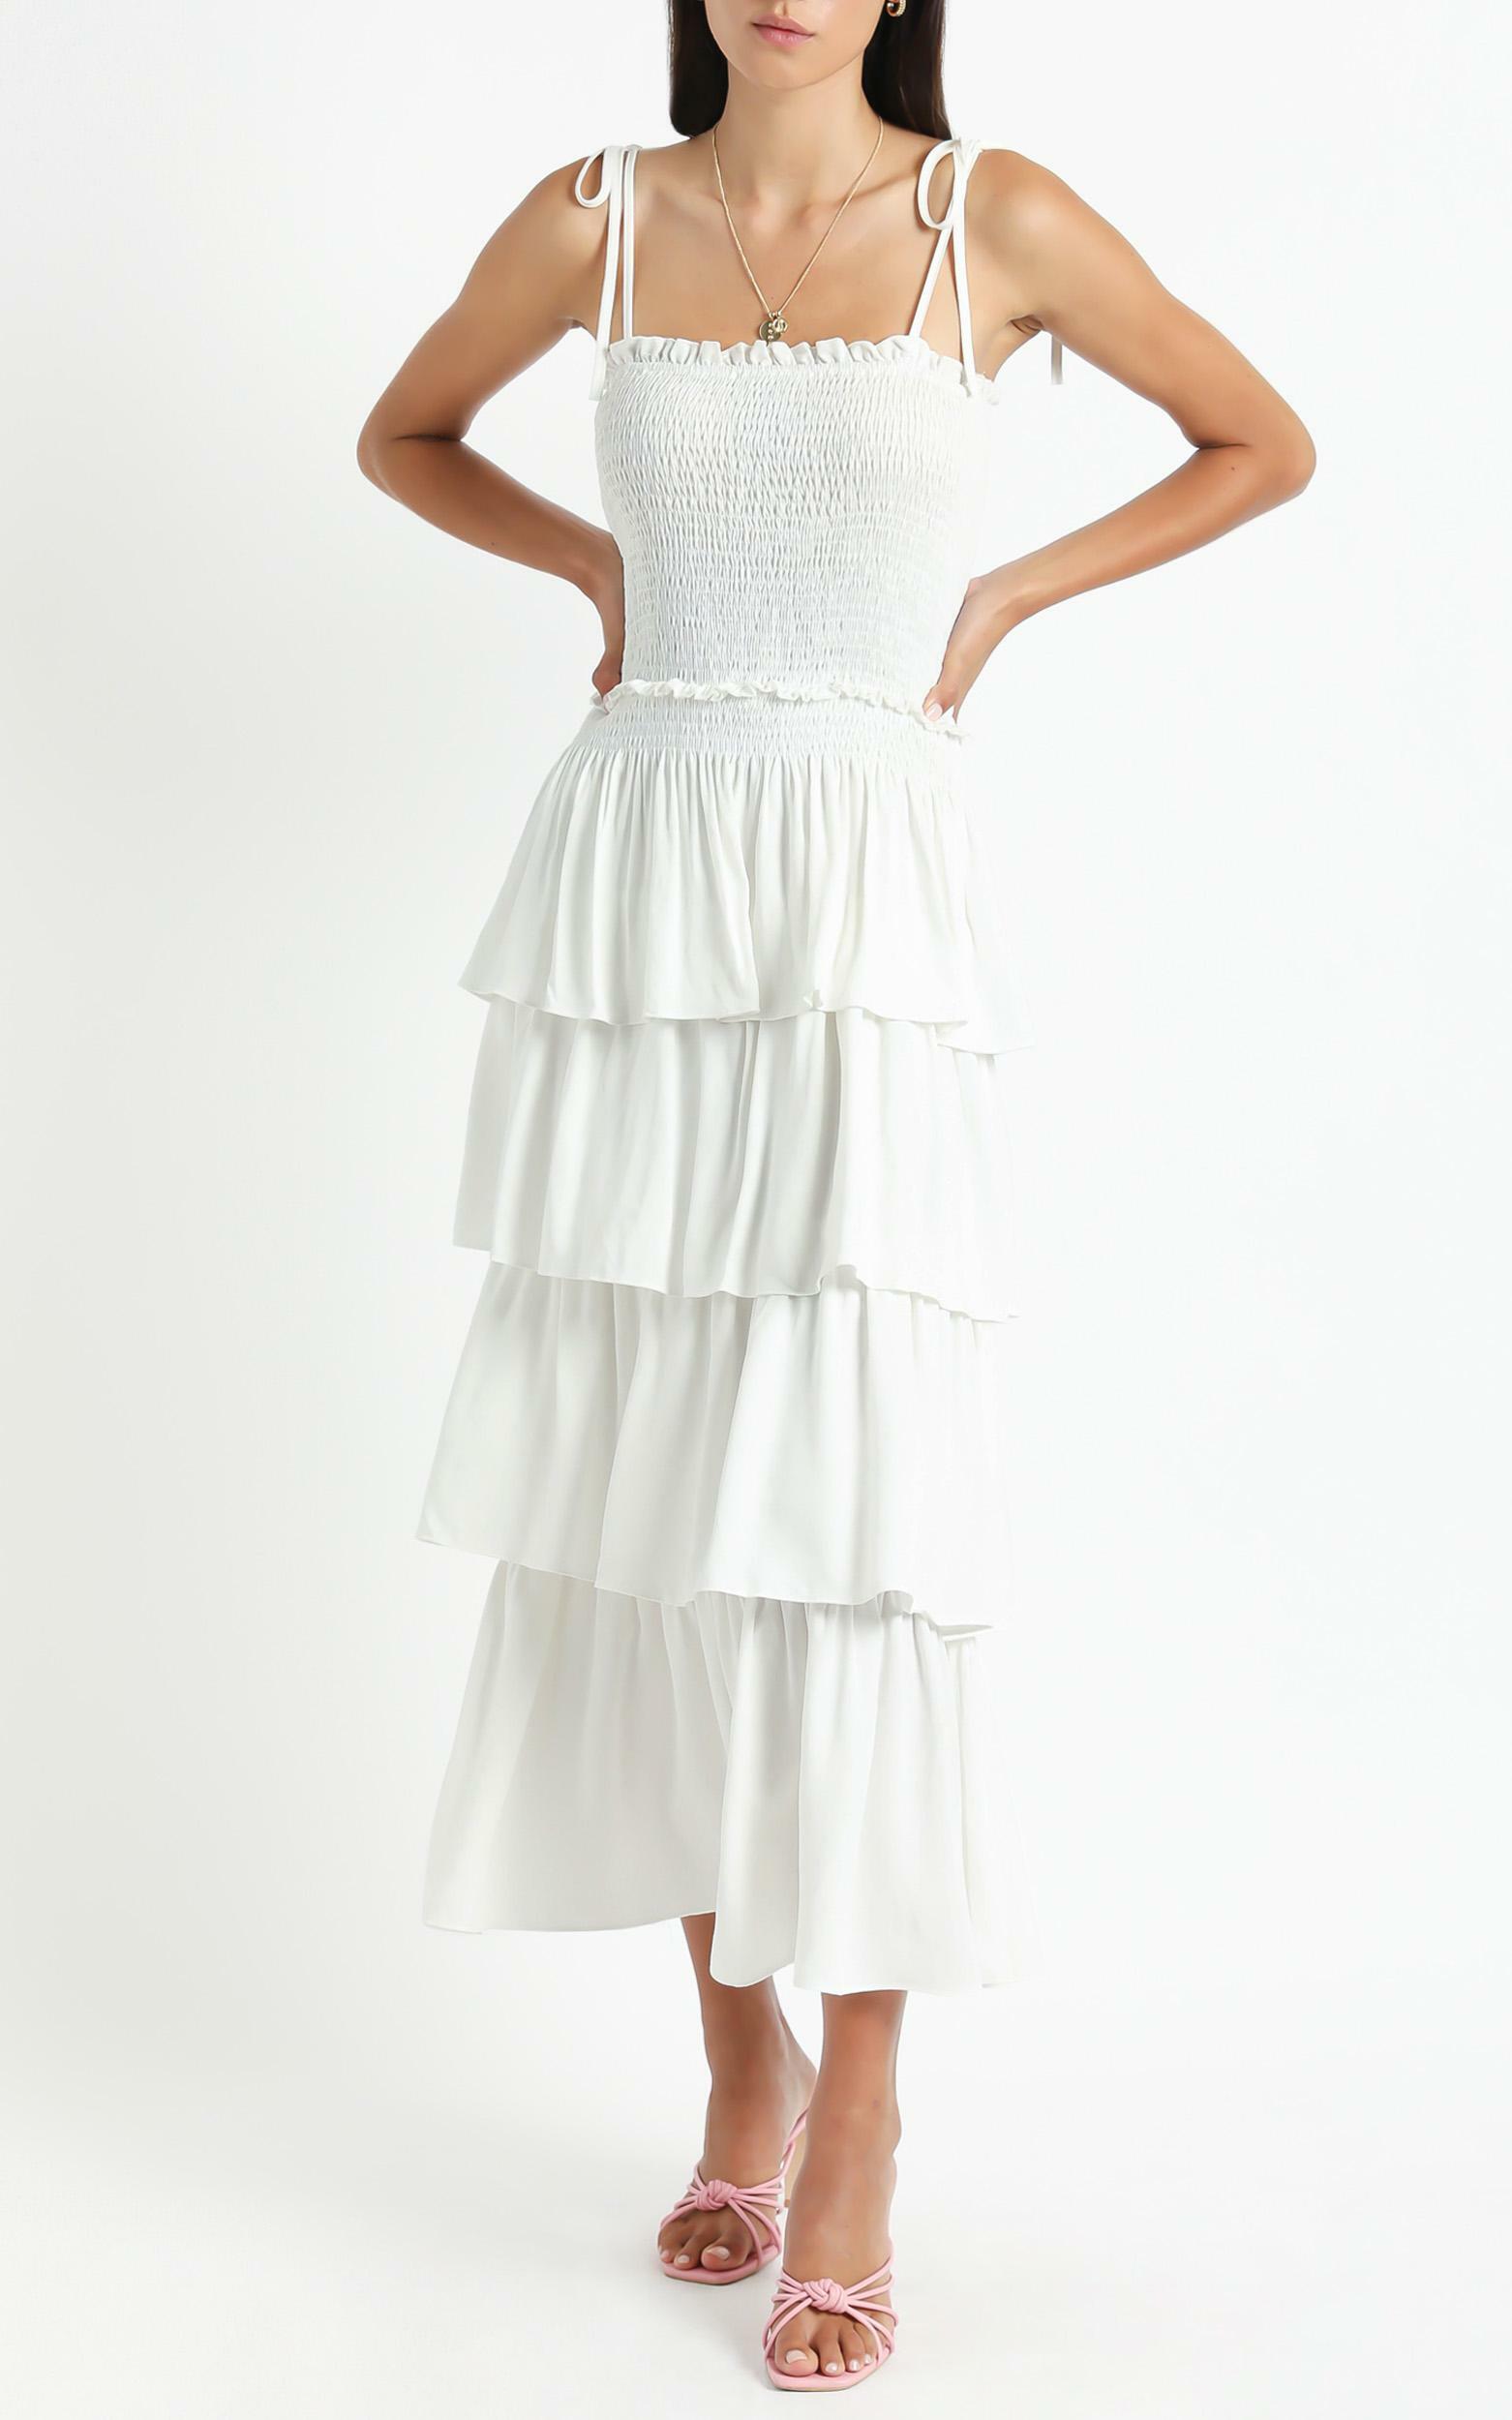 Kalli Dress in White - 6 (XS), White, hi-res image number null